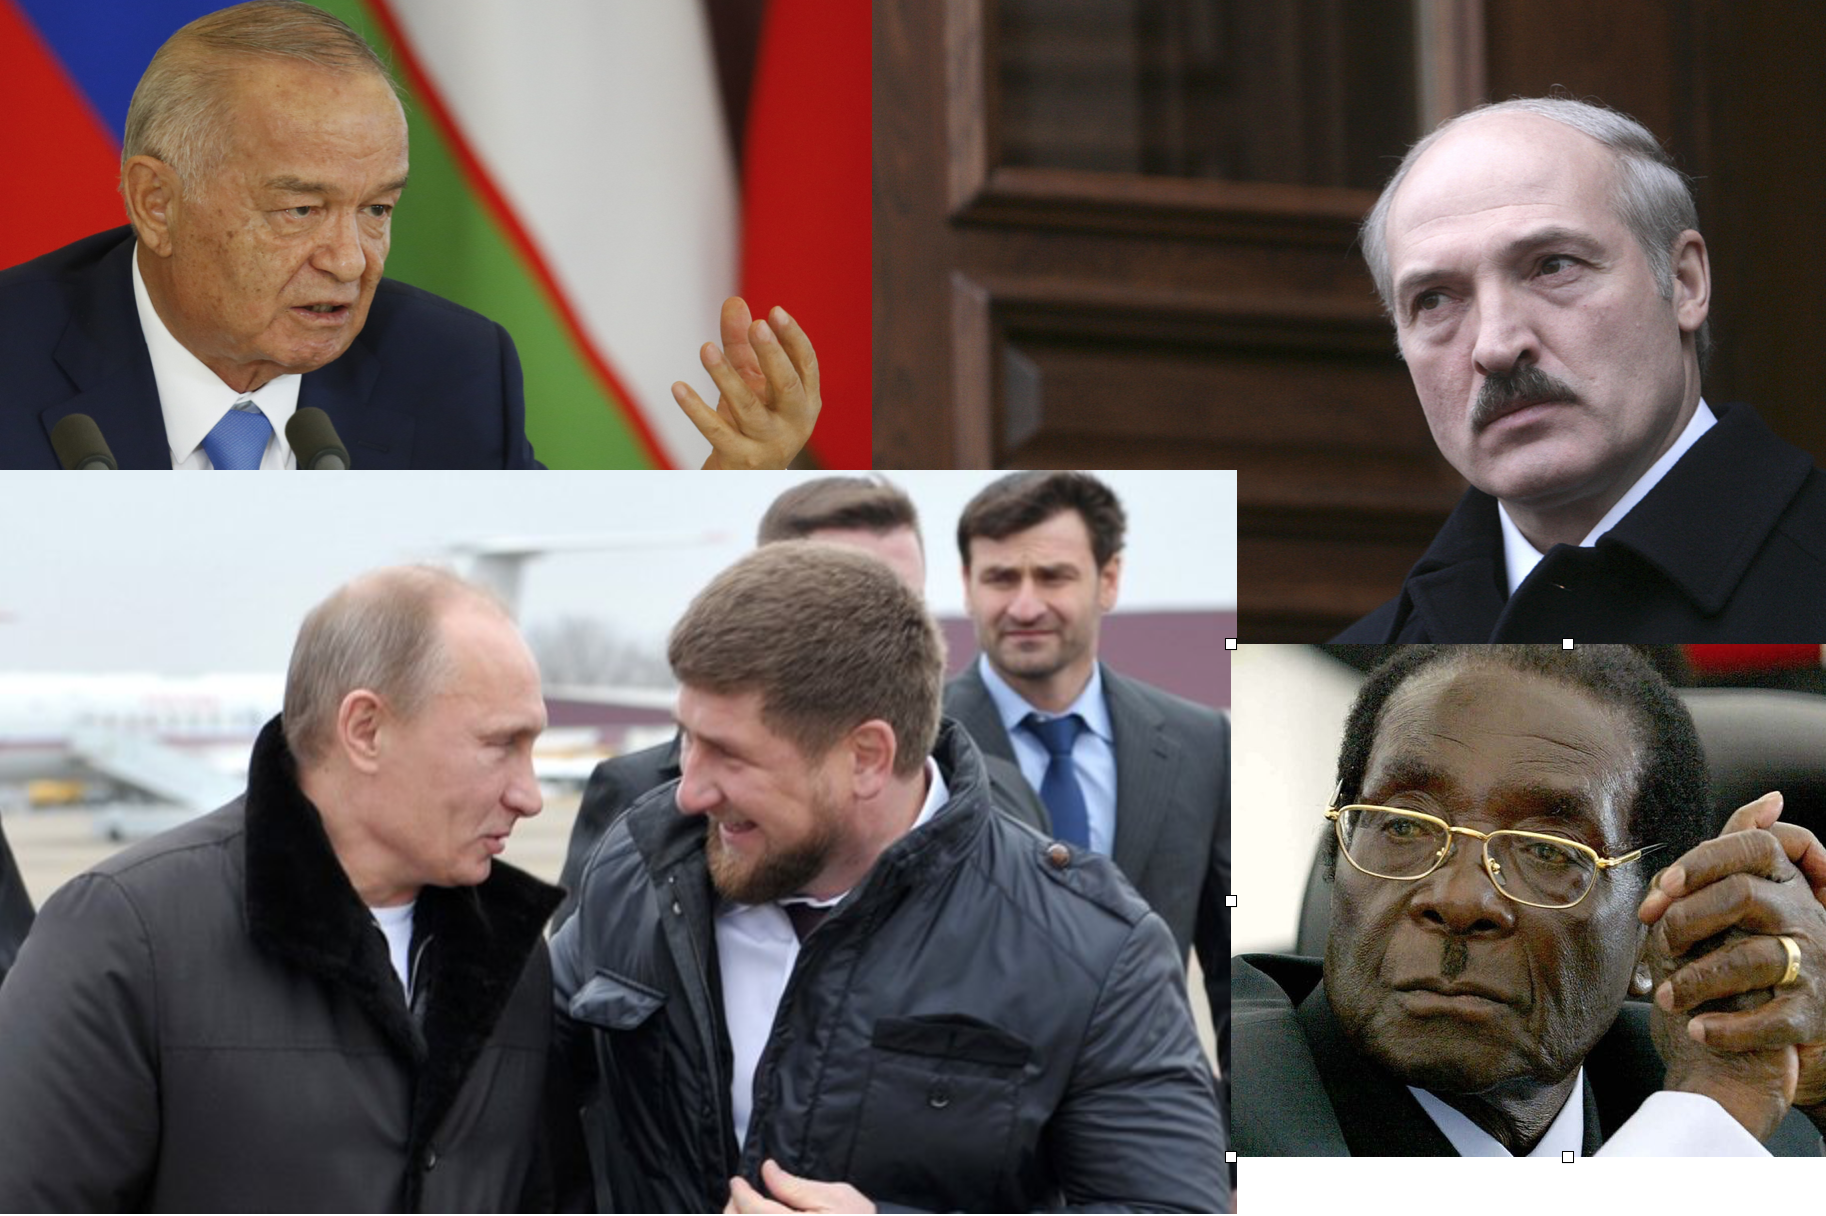 Regímenes autoritarios: Arriba izquierda: el recién fallecido Islam Karimov (uzbekistán); Abajo izquierda:Putin y Ramzan Kadyrov (Chechenia); Arriba derecha: Aleksandr Lukashenko (Bioleorusia); Abajo derecha: Robert Mugabe (Zimbabue)